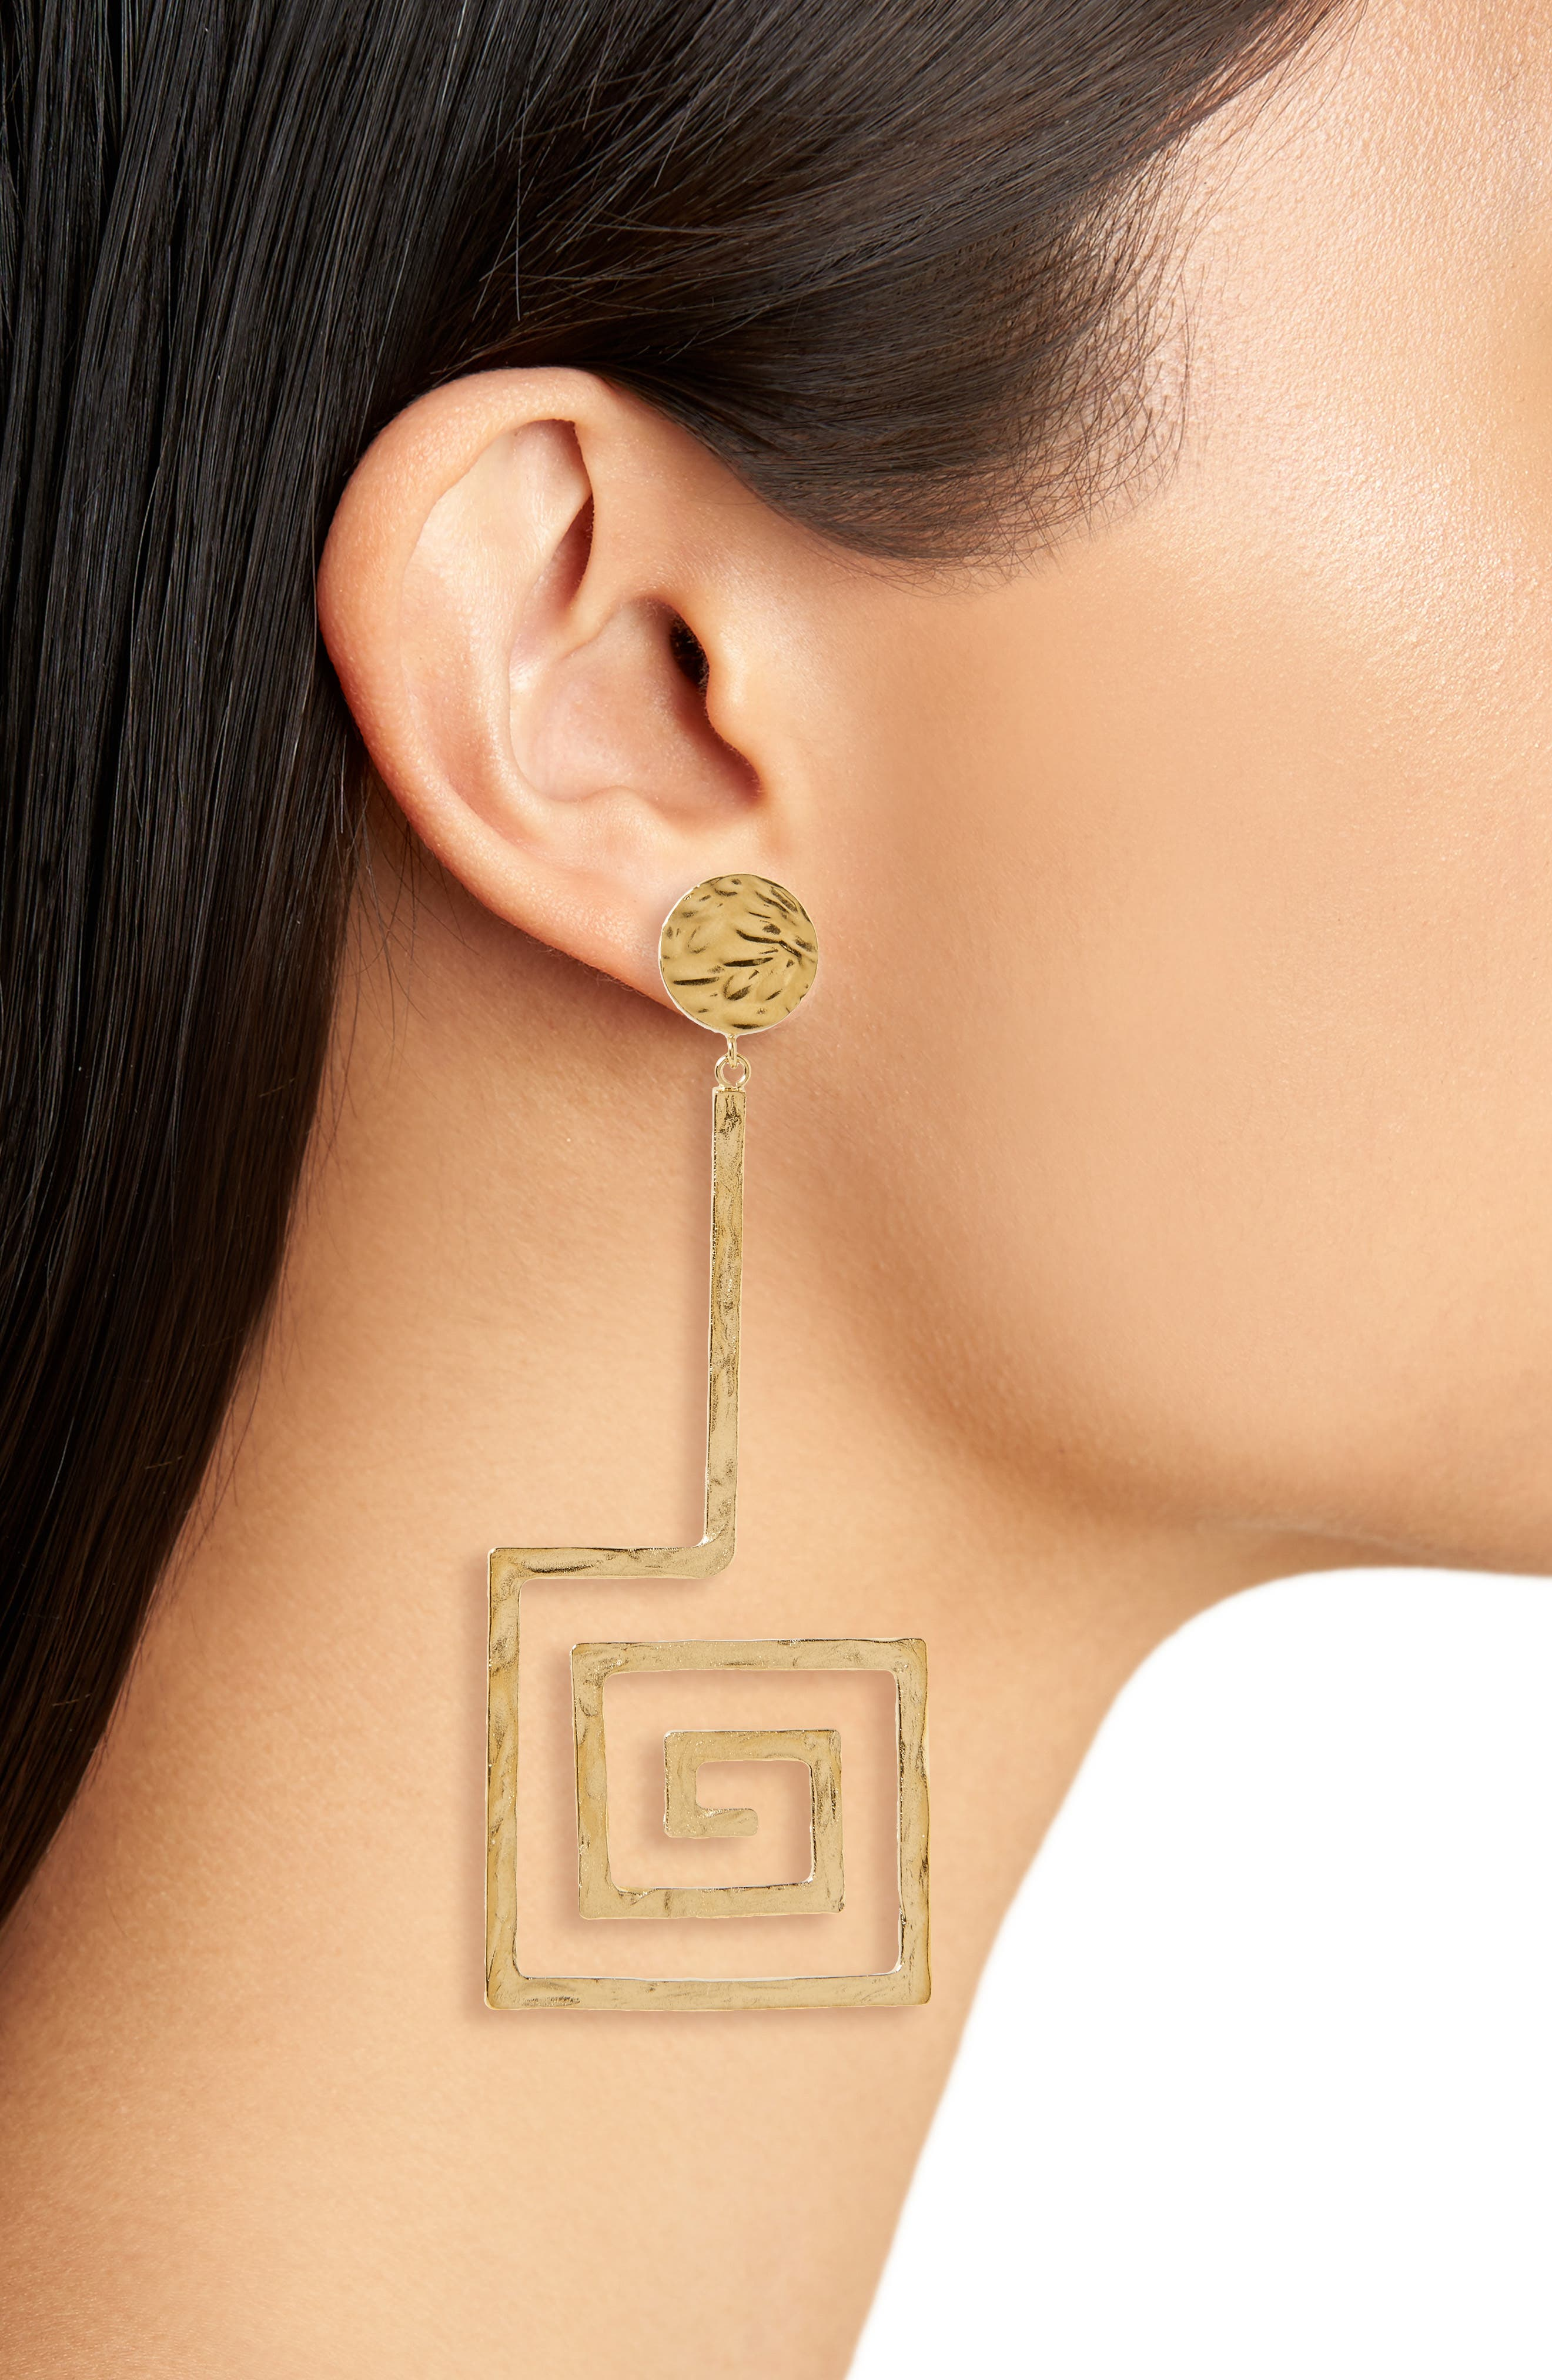 La Spirale Mismatched Statement Earrings,                             Alternate thumbnail 2, color,                             Gold/ Silver